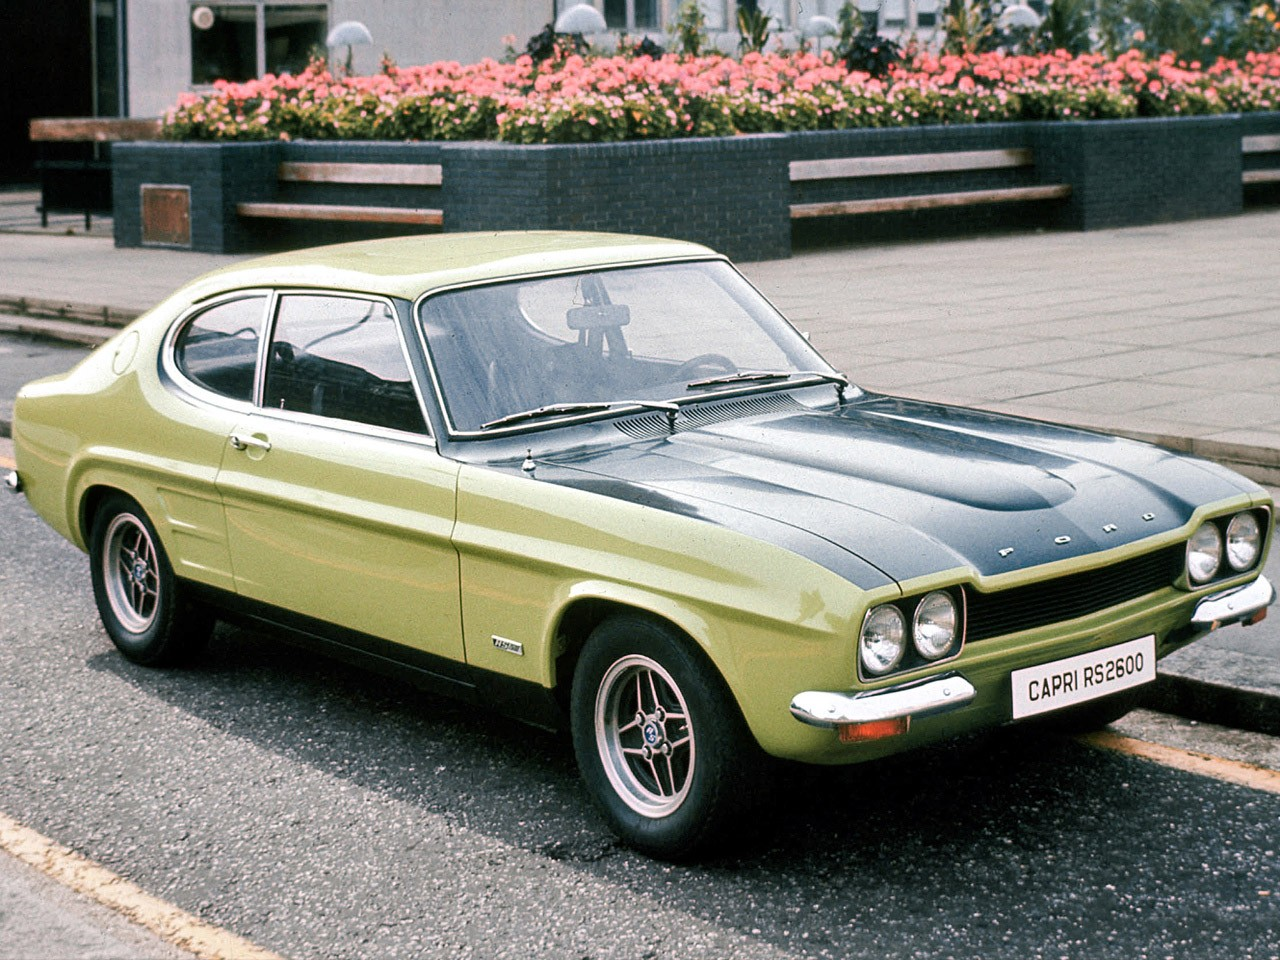 Ford Capri RS2600 1970-1974